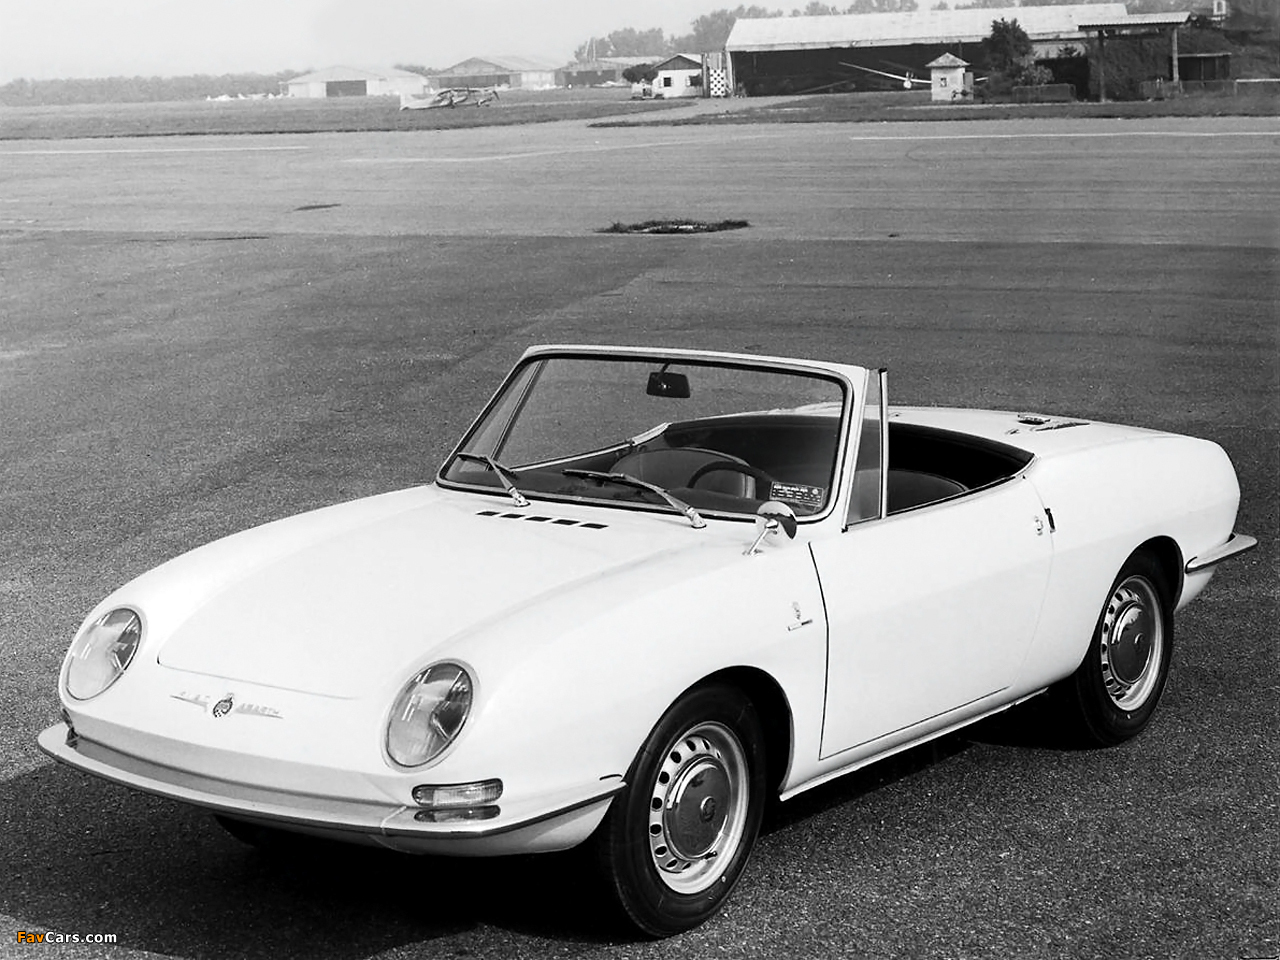 Fiat Abarth Ot 1000 Spider 1965 1968 Wallpapers 1280x960